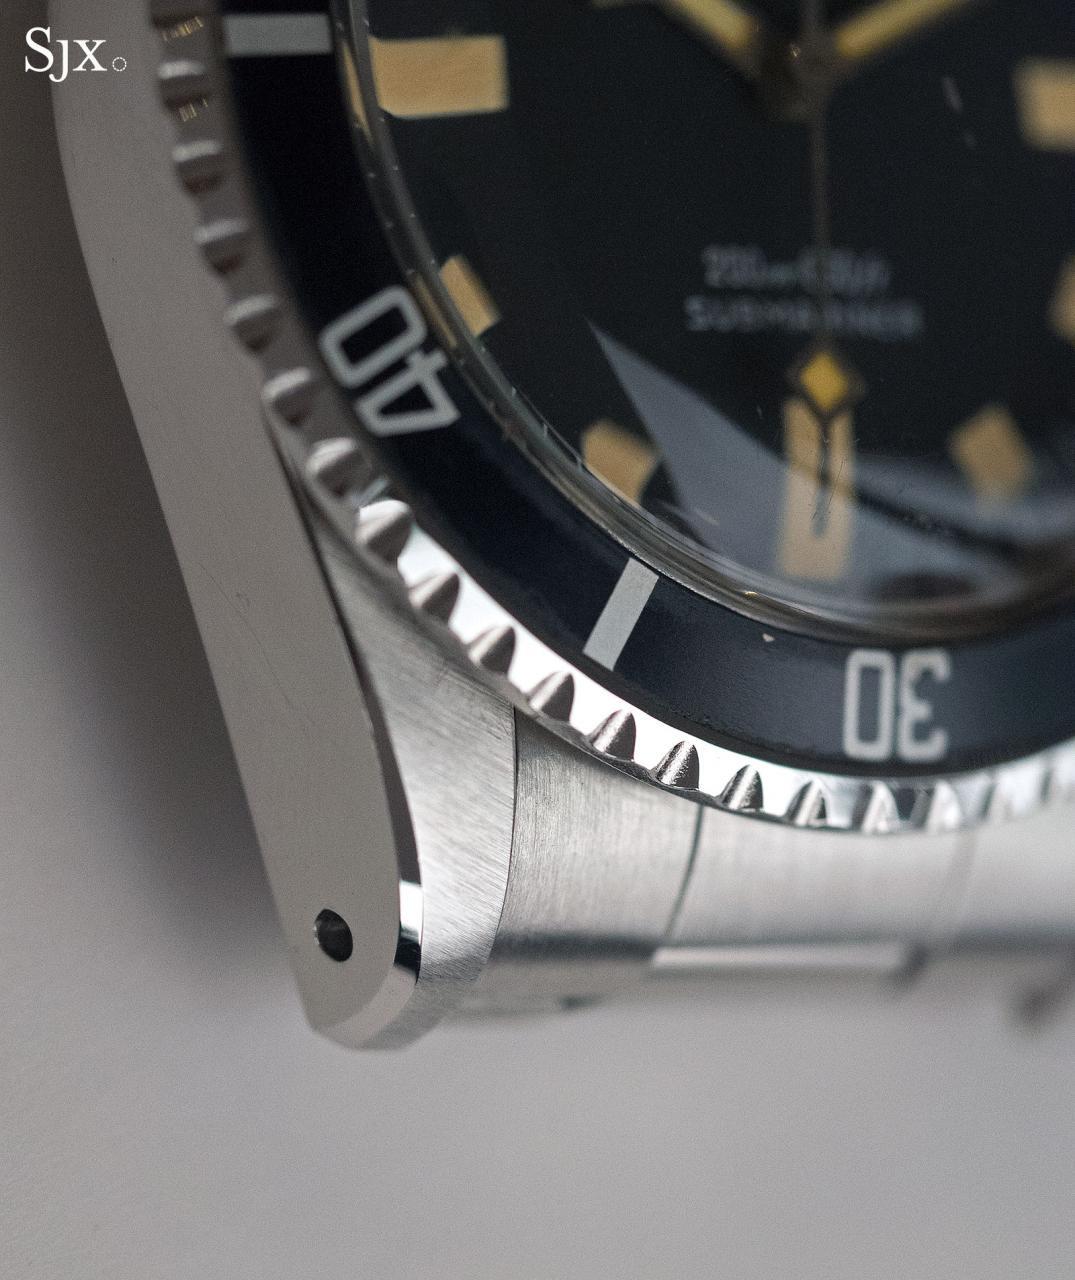 Tudor Submariner snowflake 94010-4